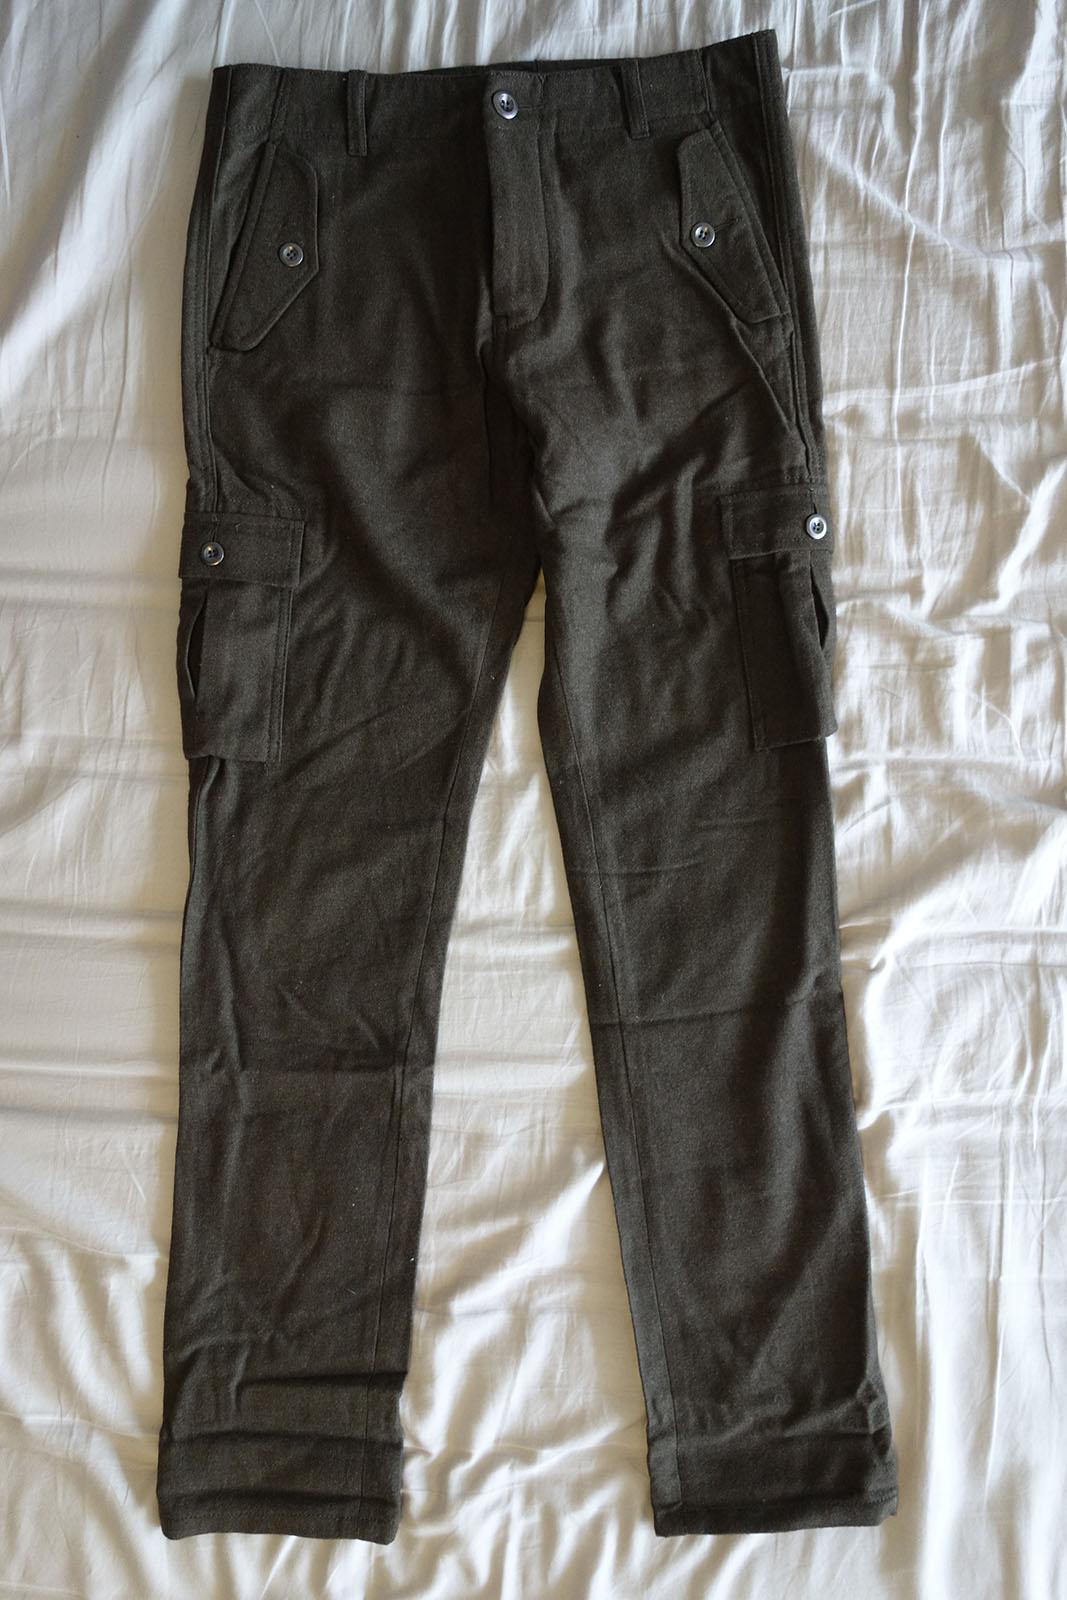 ASOS Khaki Wool Cargo Pants - Size 30/30 *Brand New*